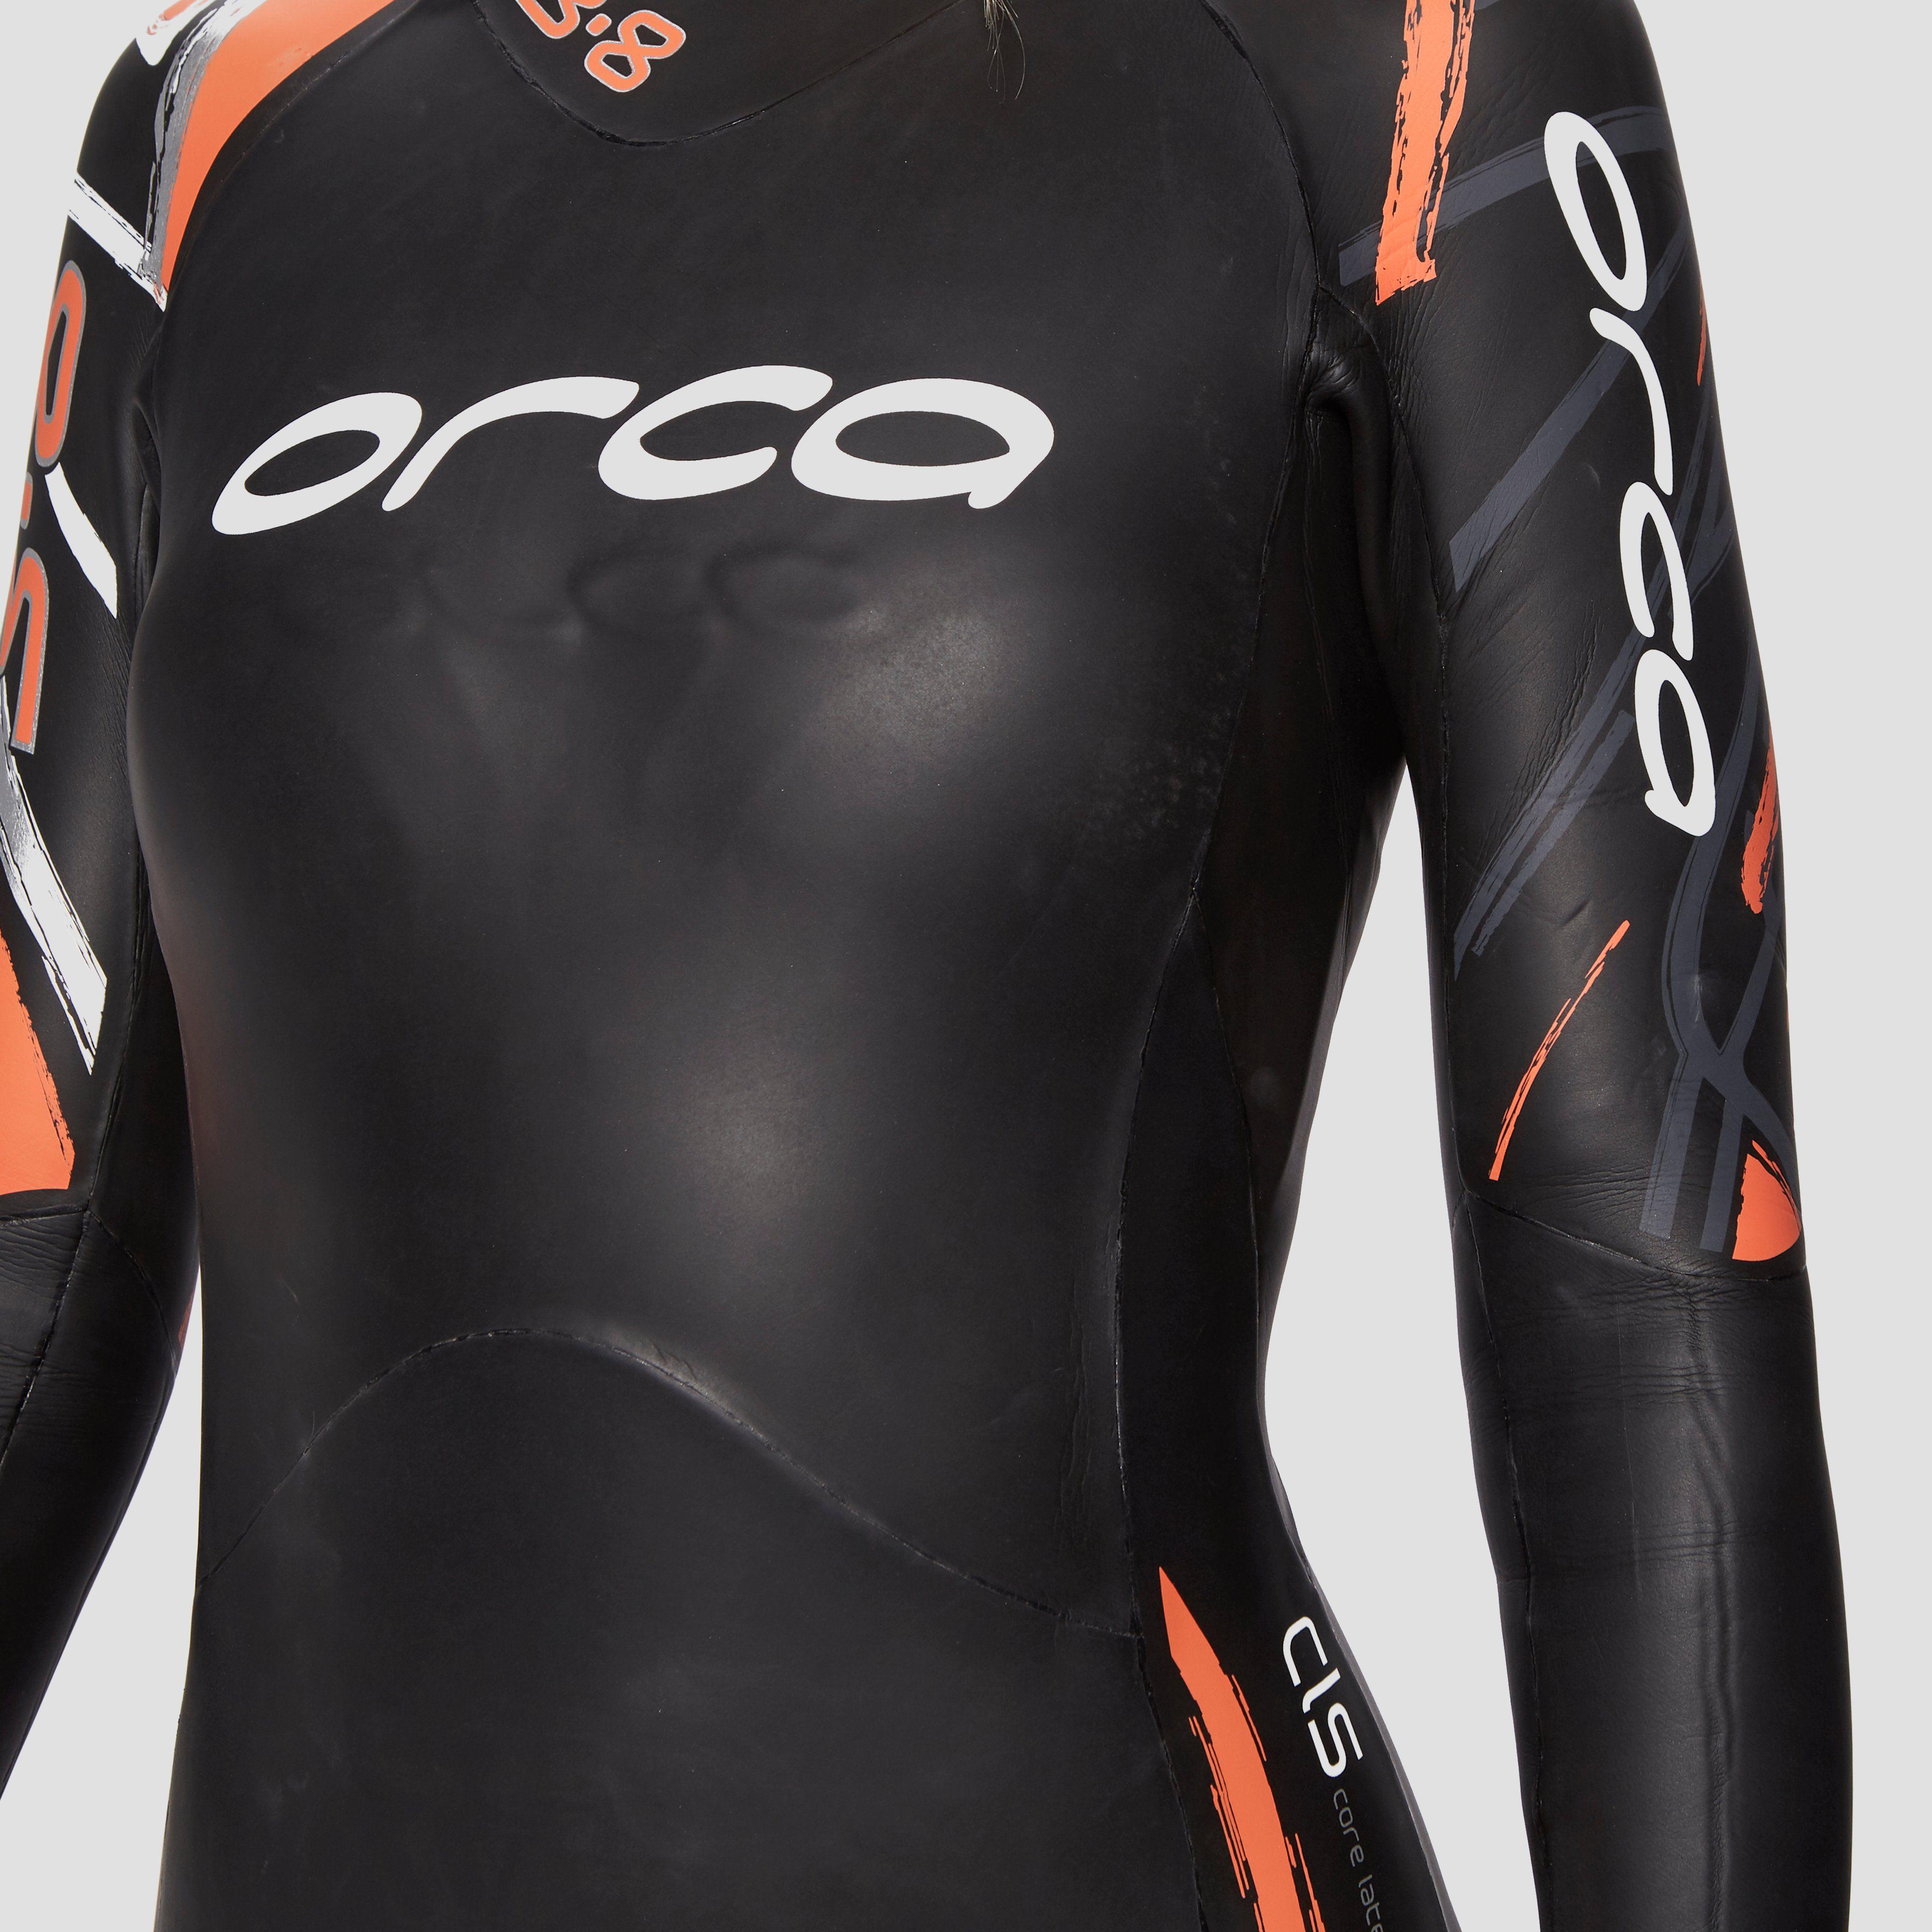 ORCA 3.8 Women's Wetsuit